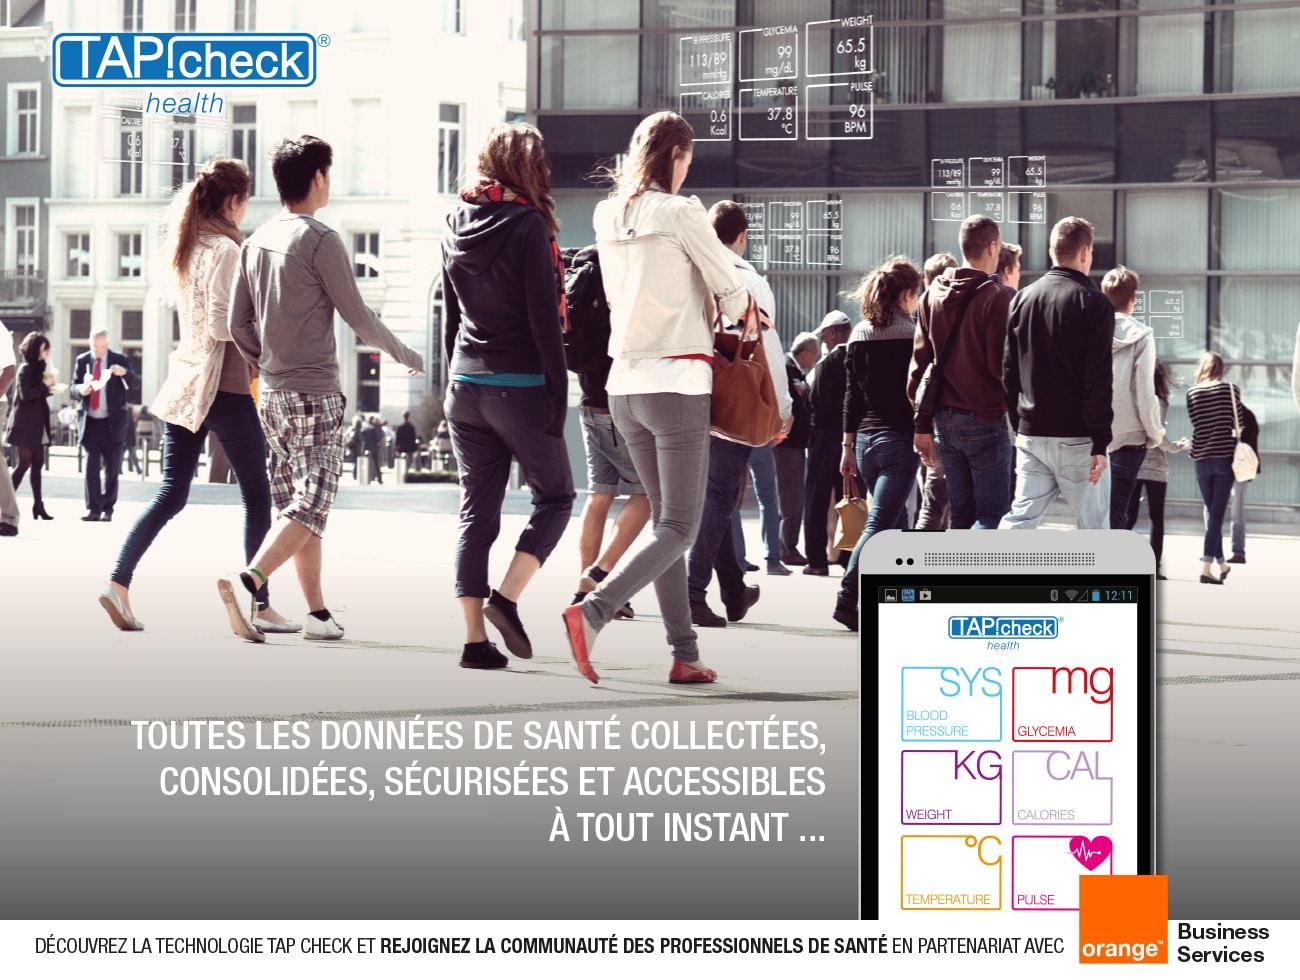 6-tapcheck-brochure-marketing-communication-bretagne